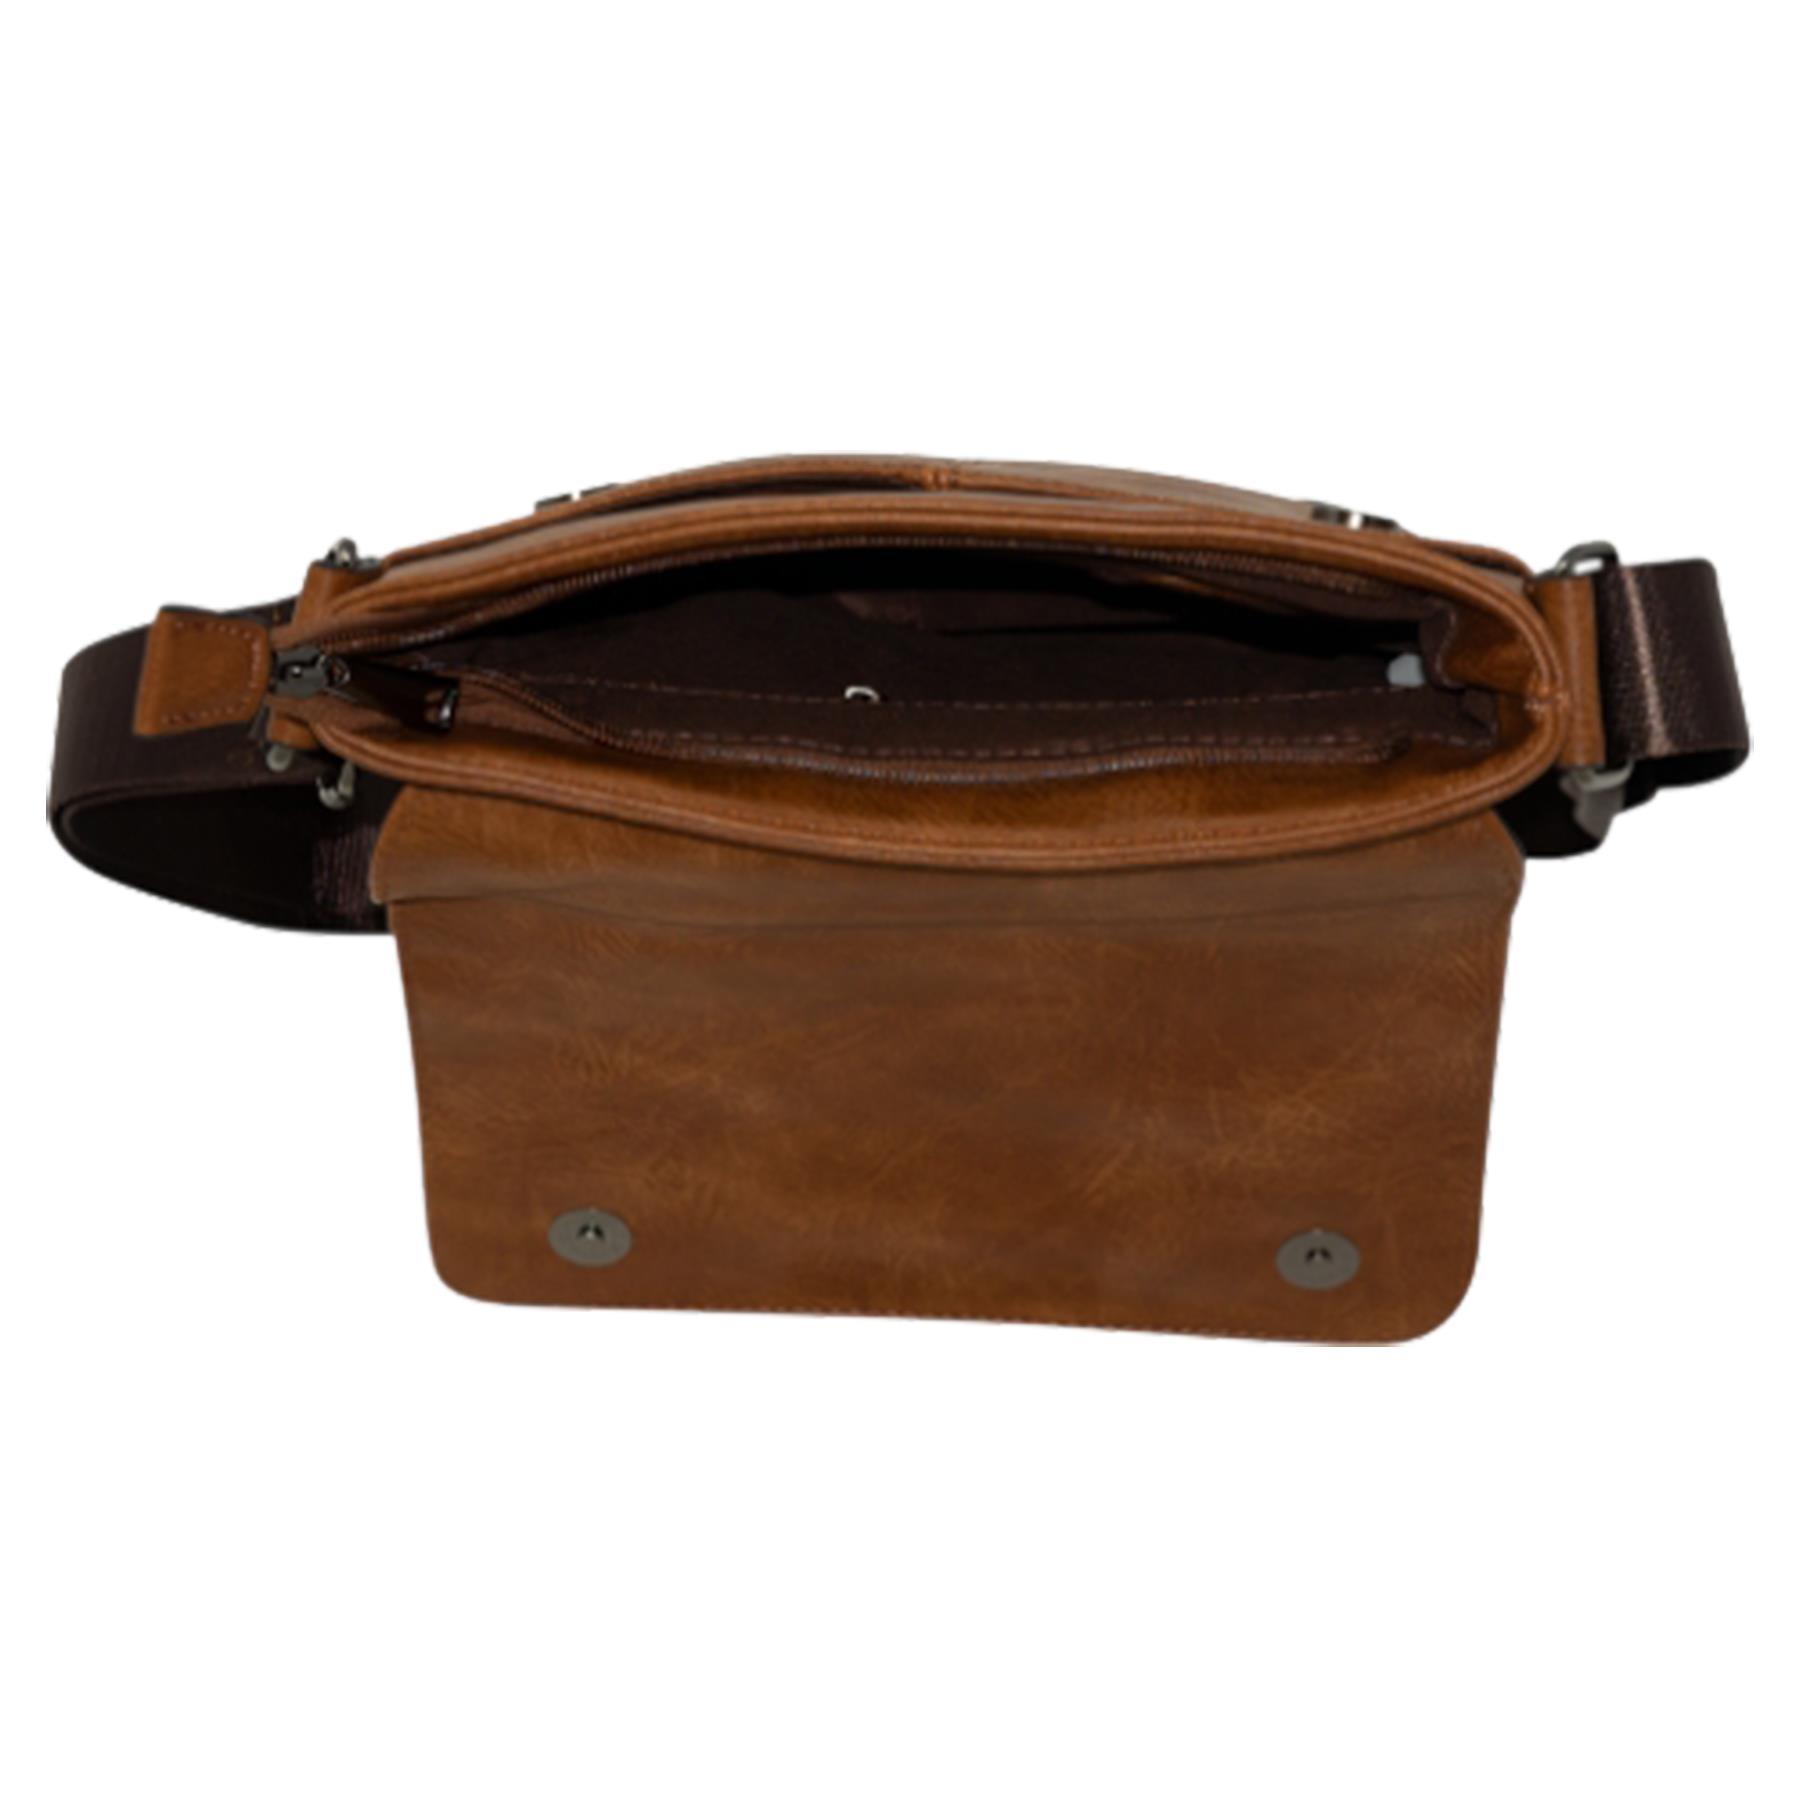 New-Plain-Faux-Leather-Men-s-Travel-Casual-Flap-Over-Messenger-Bag thumbnail 9